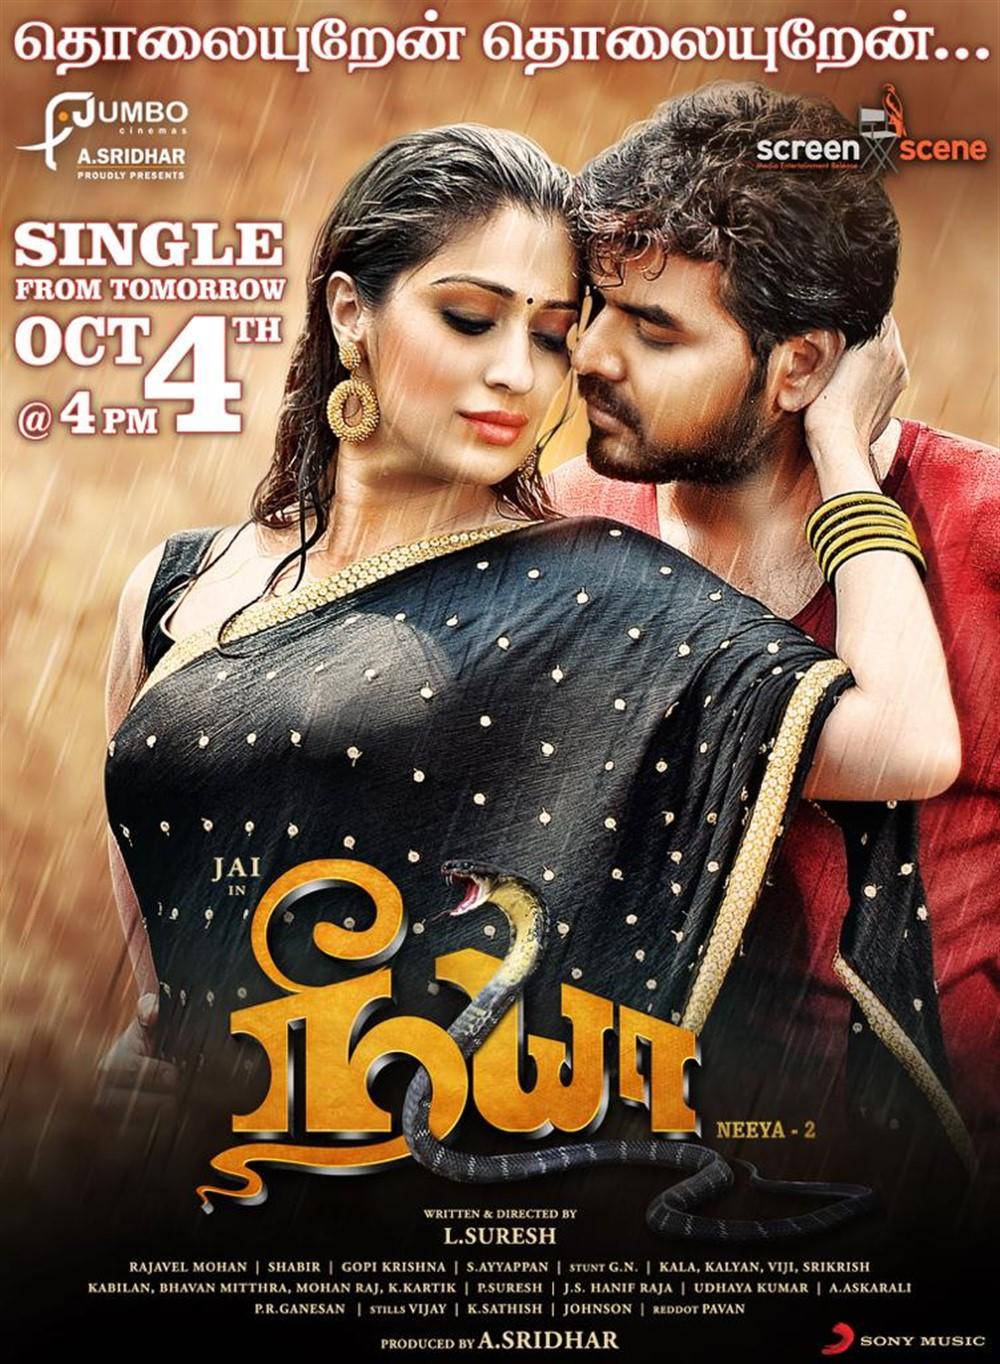 Raai Laxmi Jai Neeya 2 First Single Release Poster